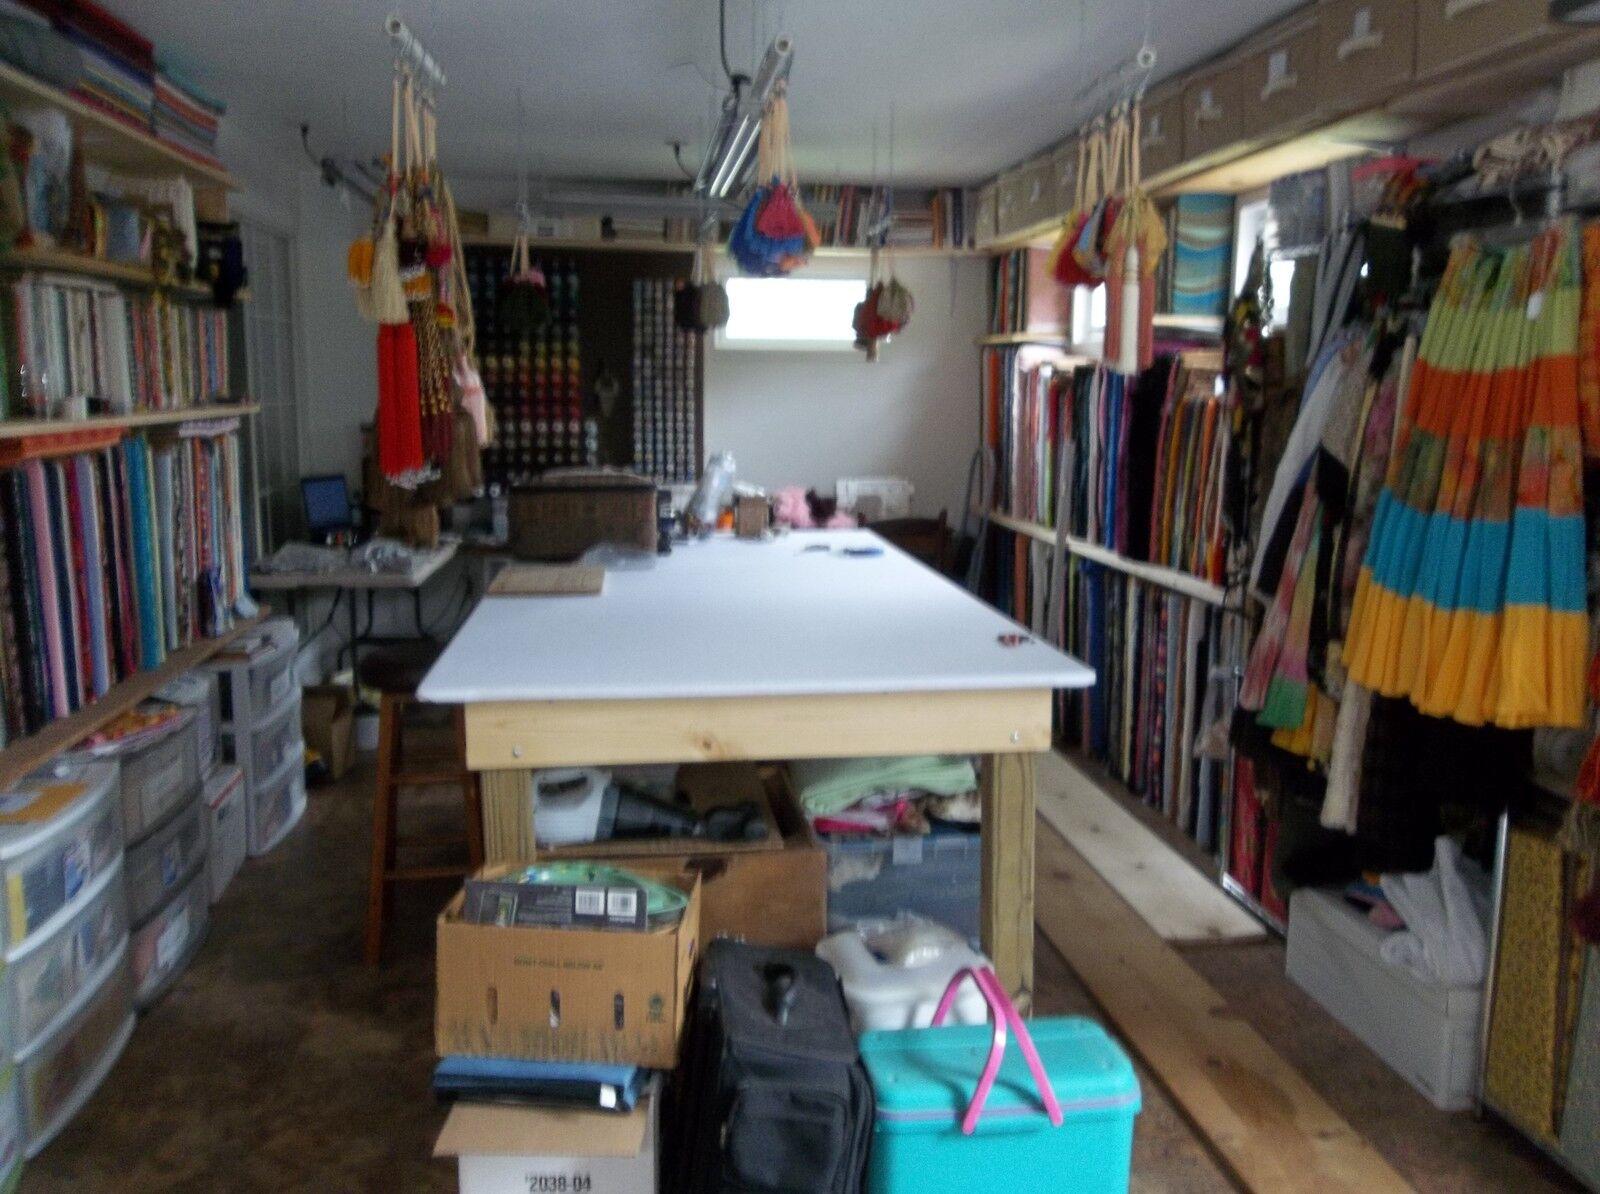 Ursilla s Closet